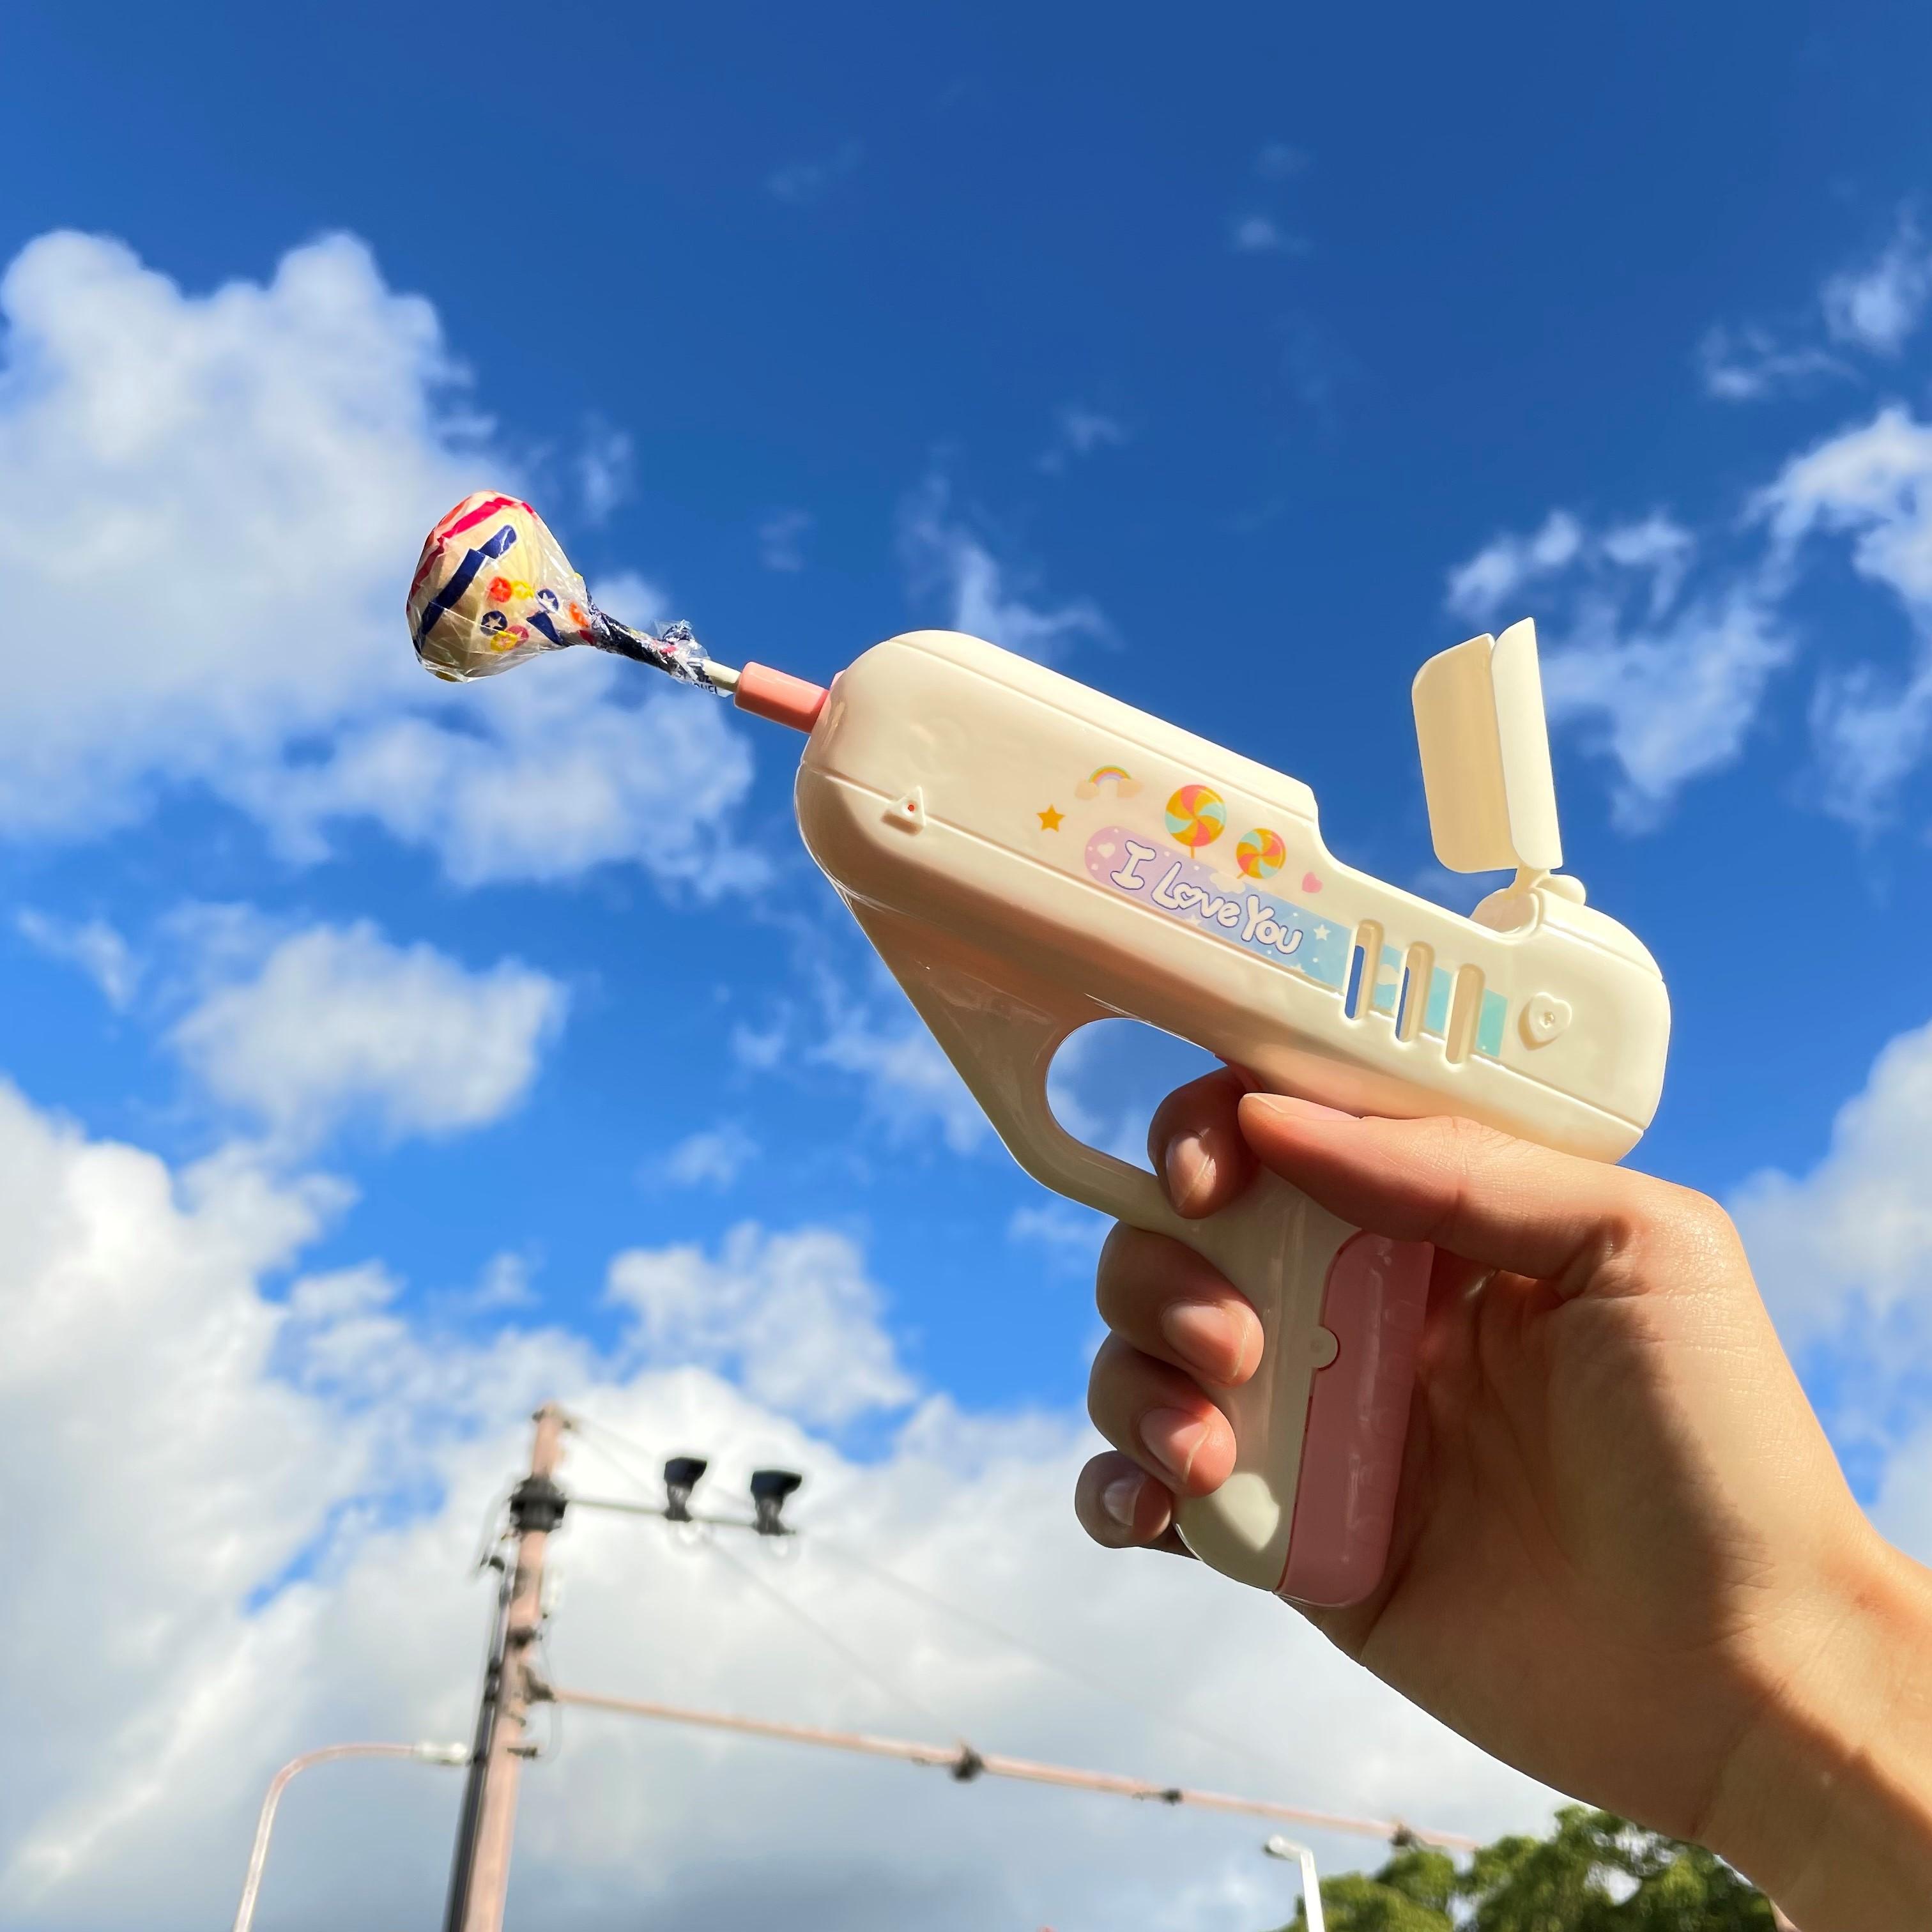 TikTok総再生回数2億回超!海外SNSで大人気の「キャンディーガン」がサンキューマートに日本初上陸🍭🔫💥